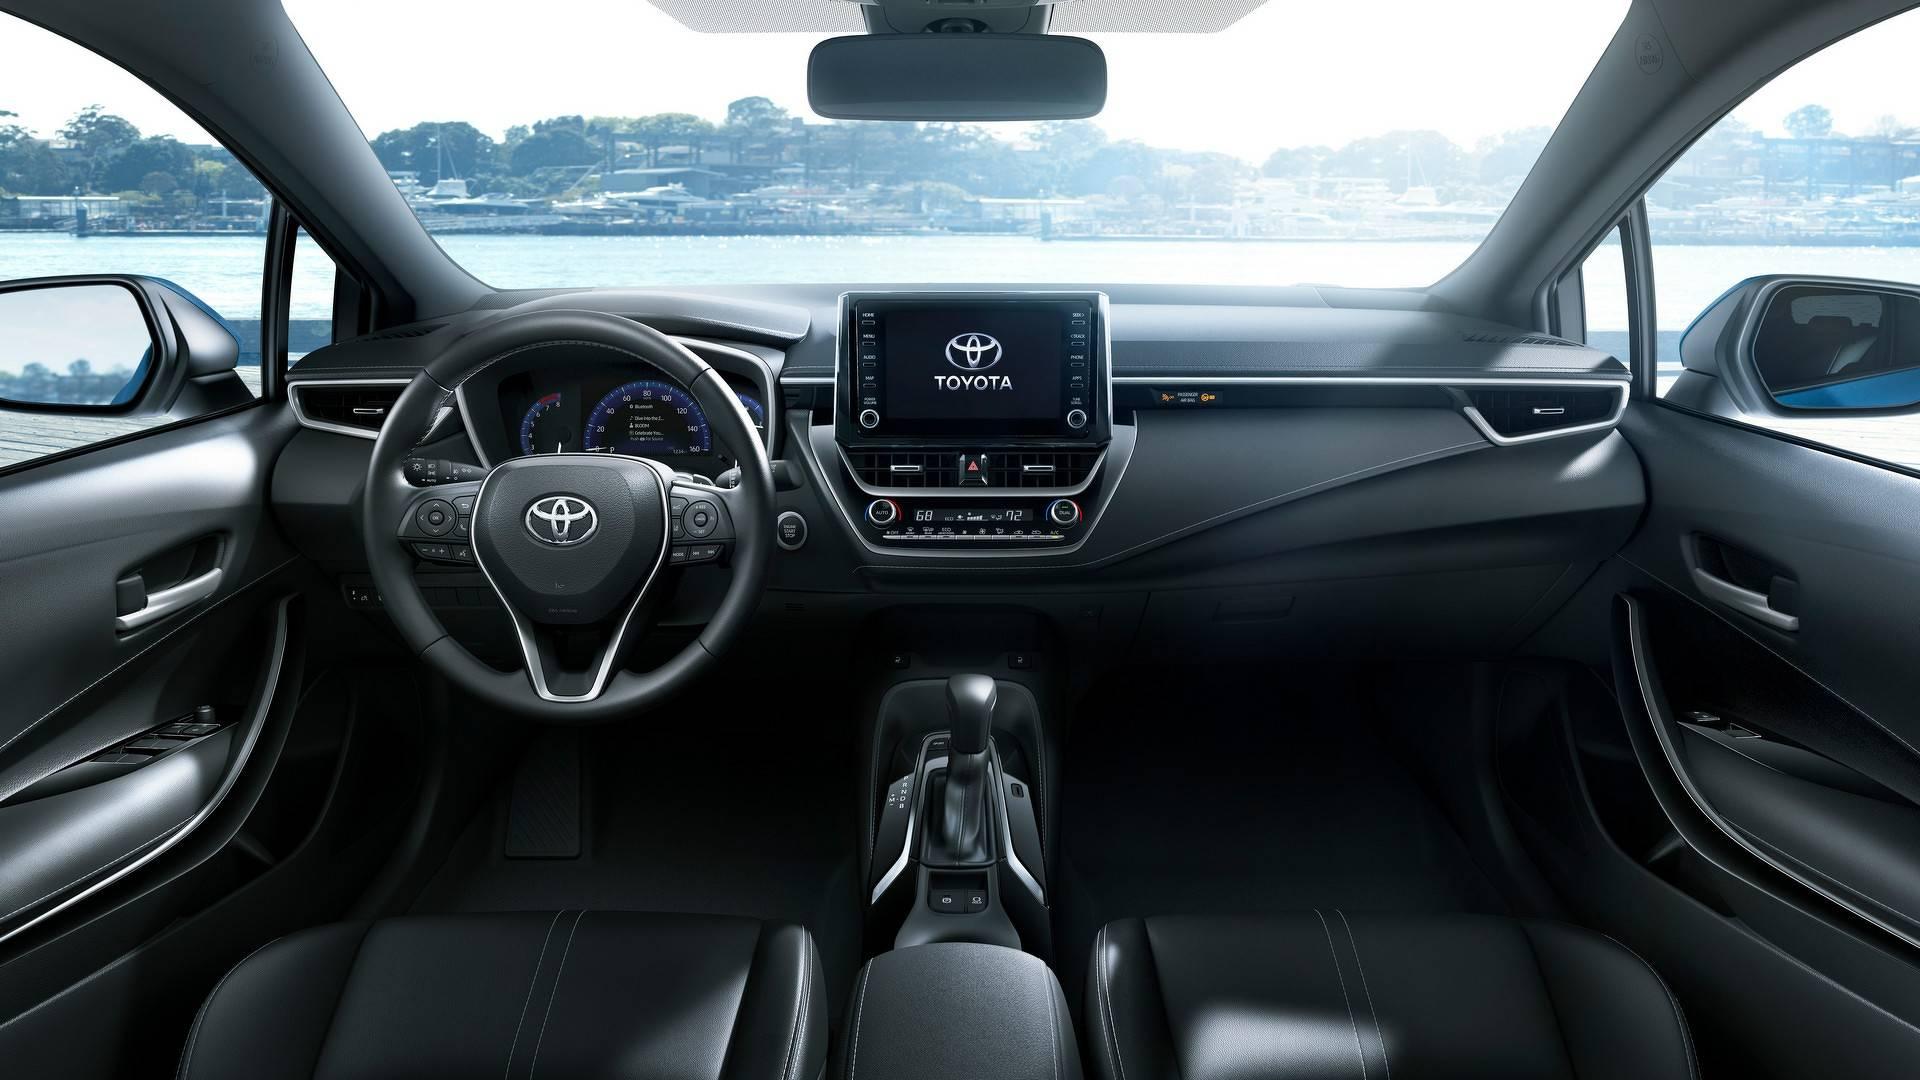 Toyota Corolla 2018 interior